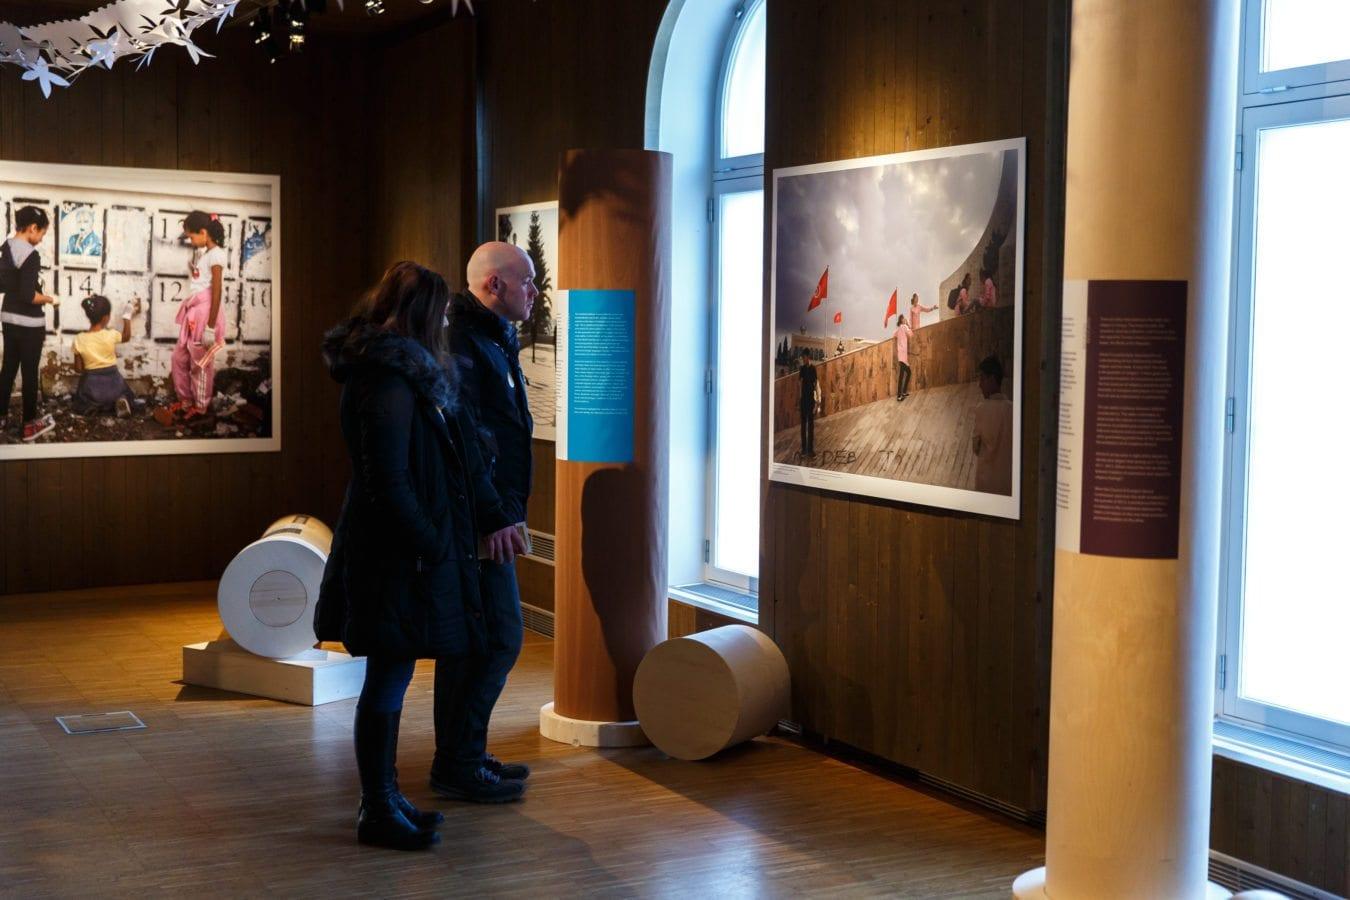 Documentation of the Nobel Peace Prize exhibition 2015 The Tunisian Method *** Local Caption *** Photo: Johannes Granseth / Nobel Peace Center